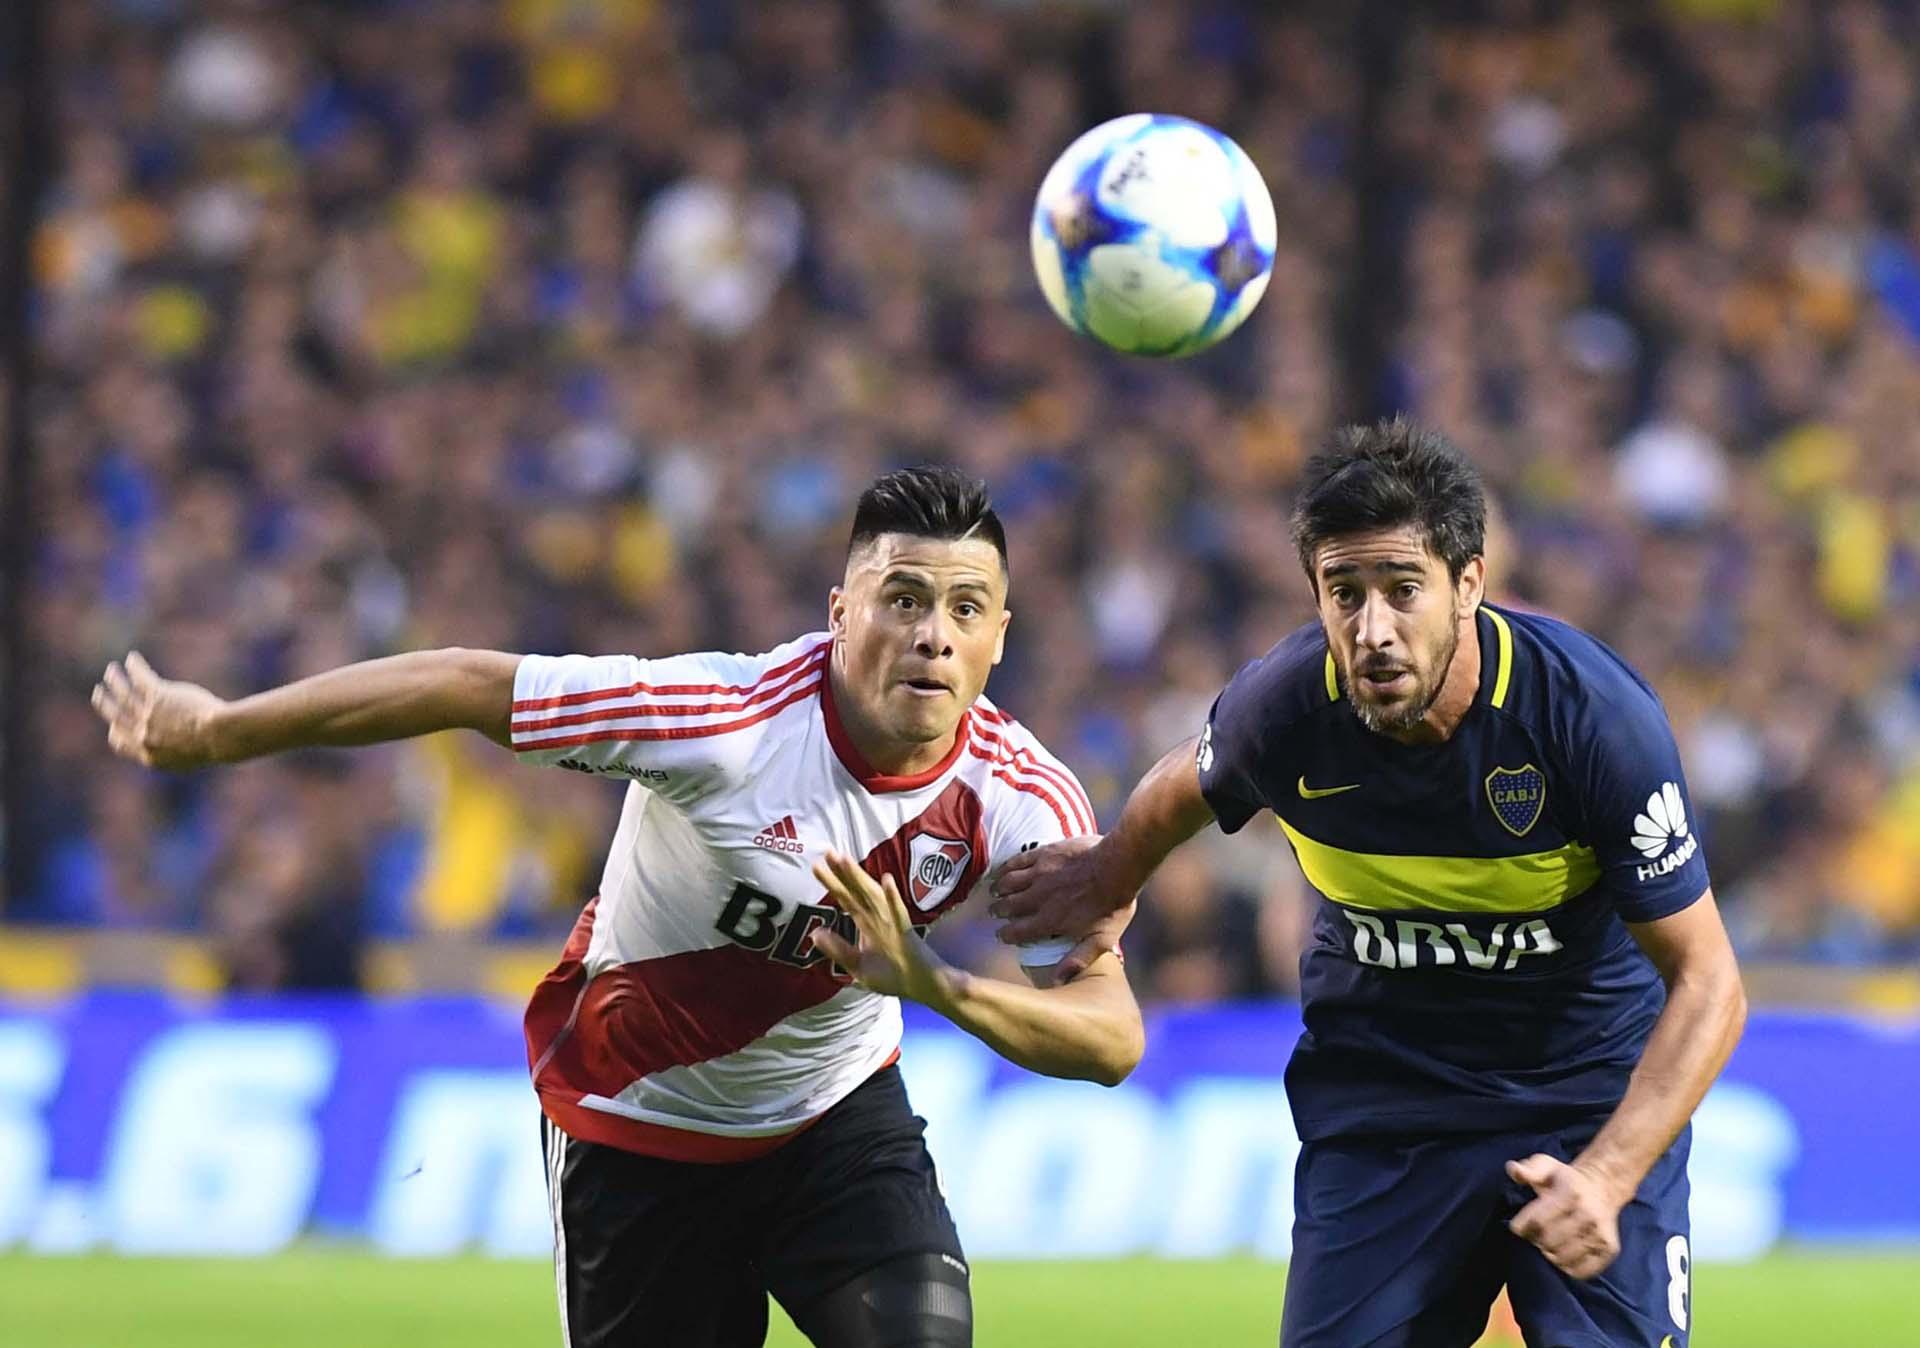 El riverplatense Jorge Moreira y el xeineze Pablo Pérez disputan el balón